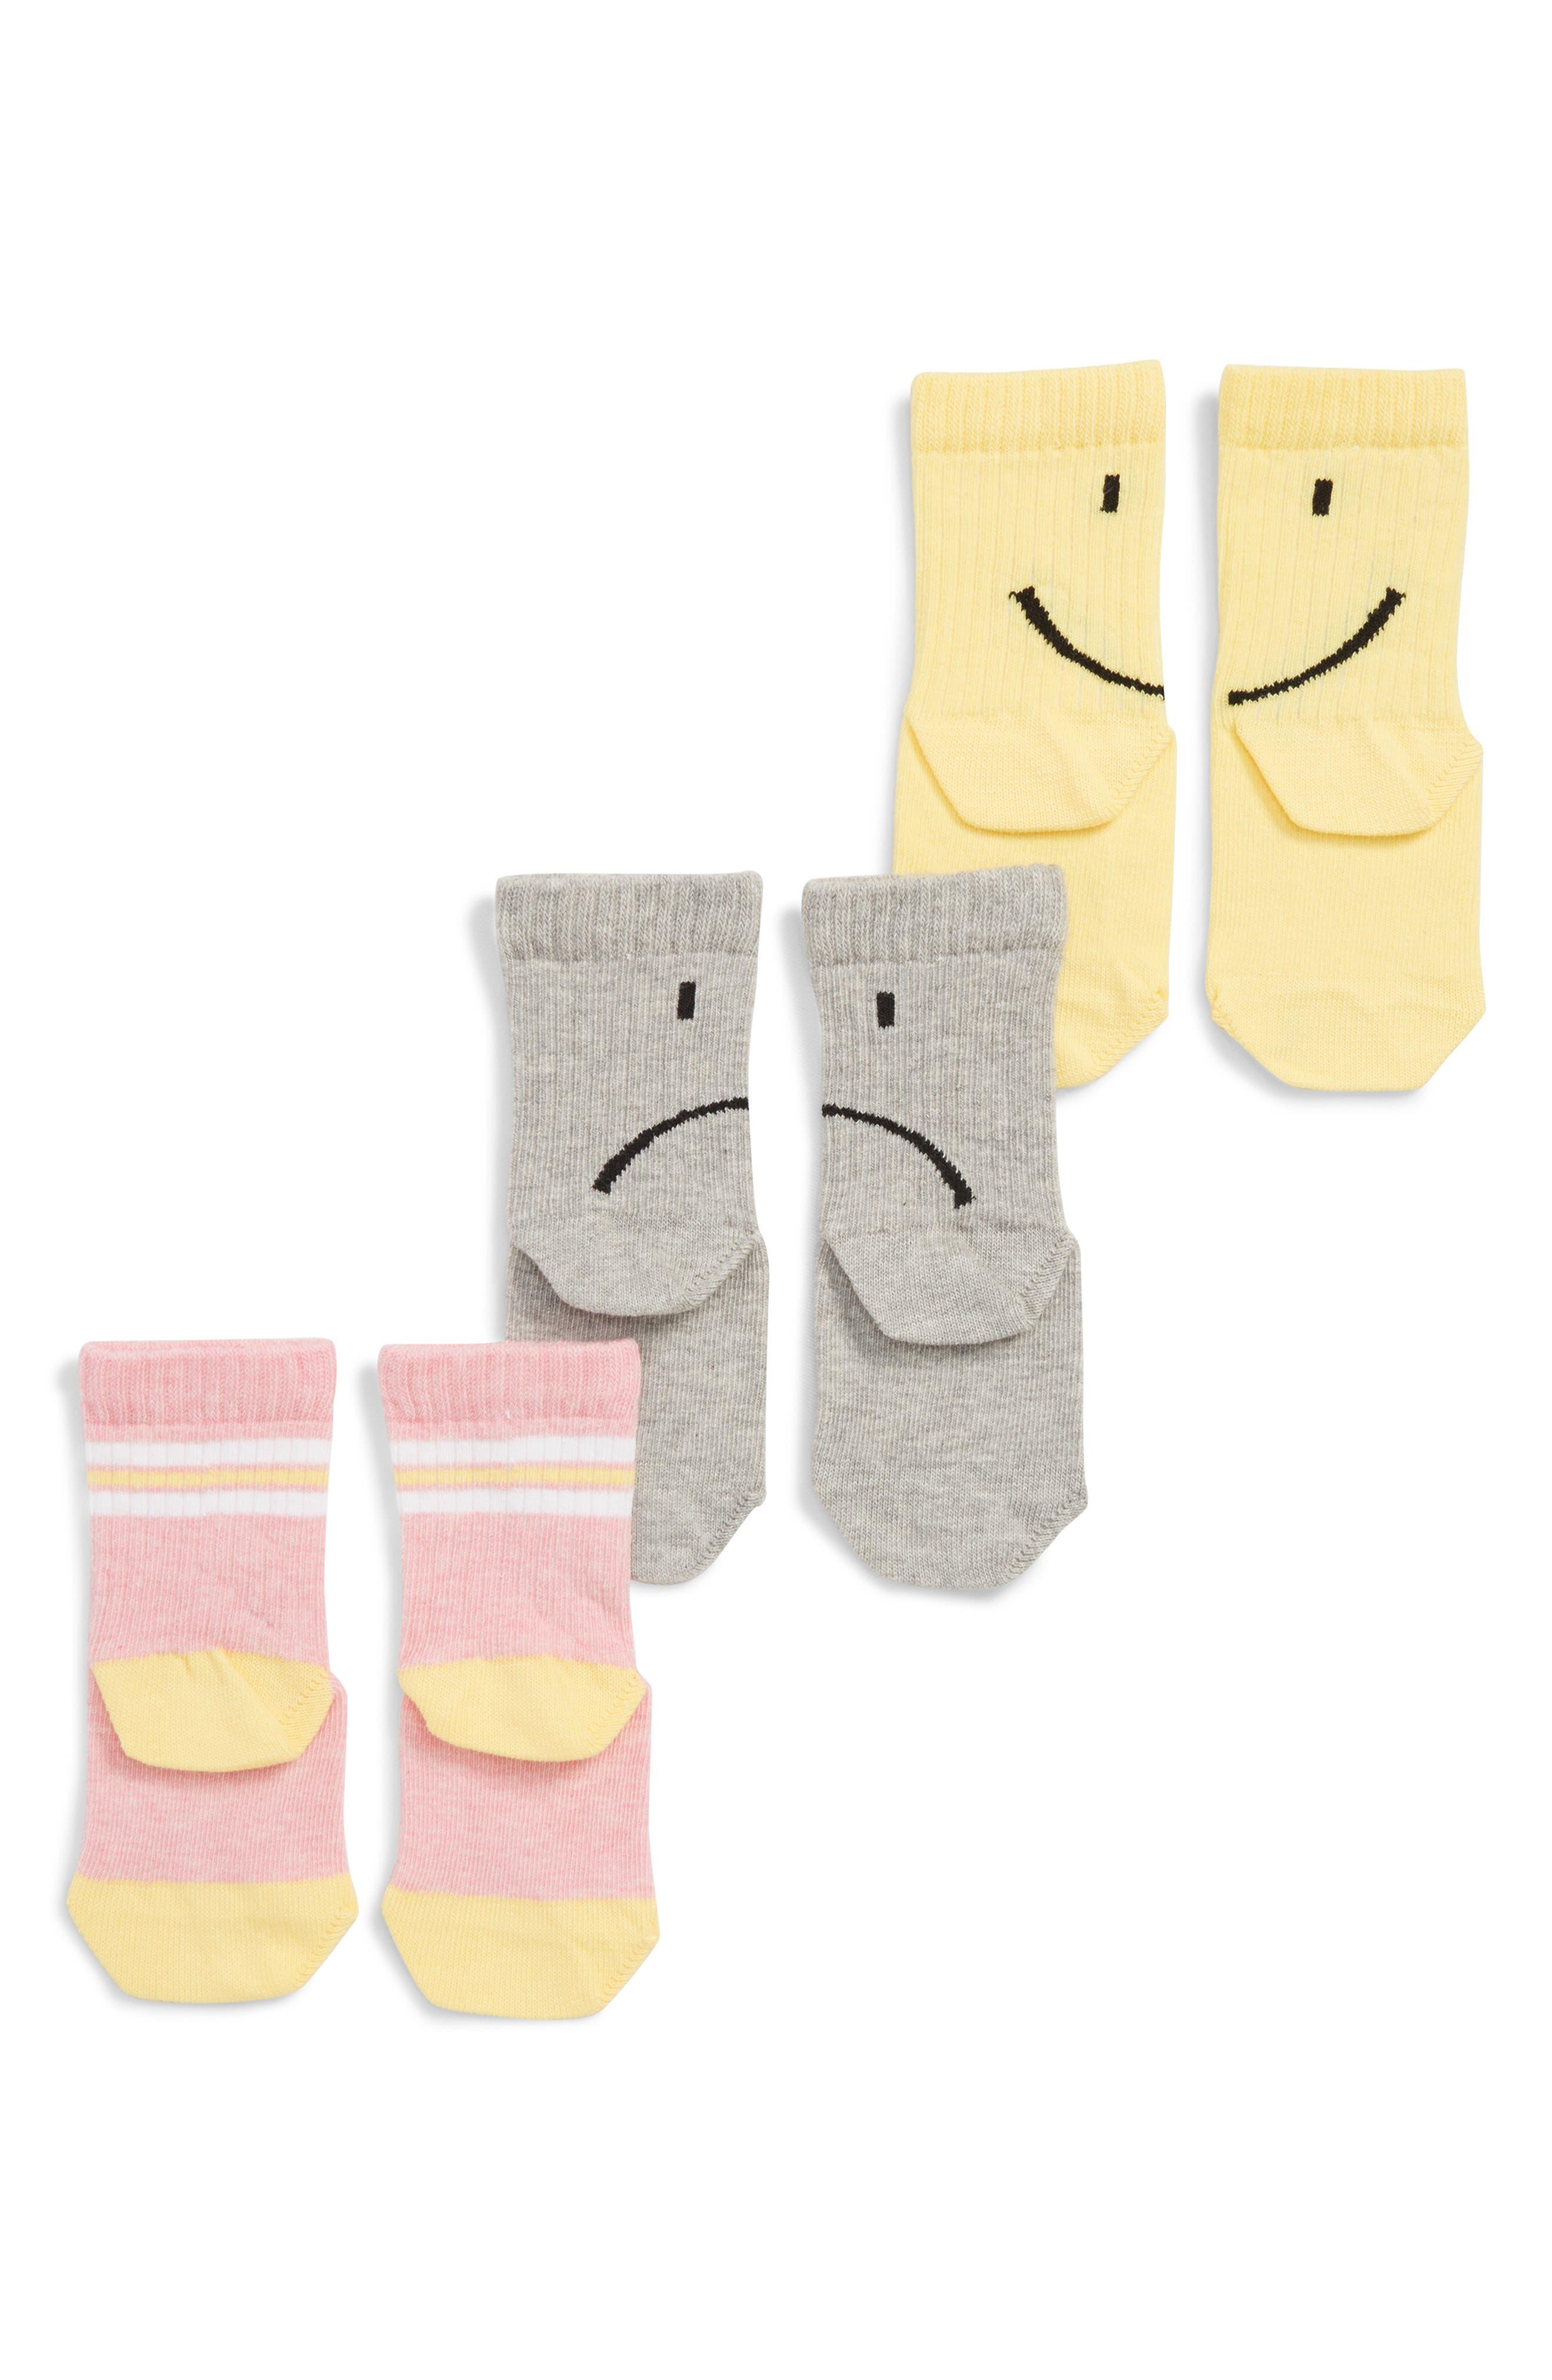 Smile 3-Pack Crew Socks,                             Alternate thumbnail 2, color,                             YELLOW MULTI